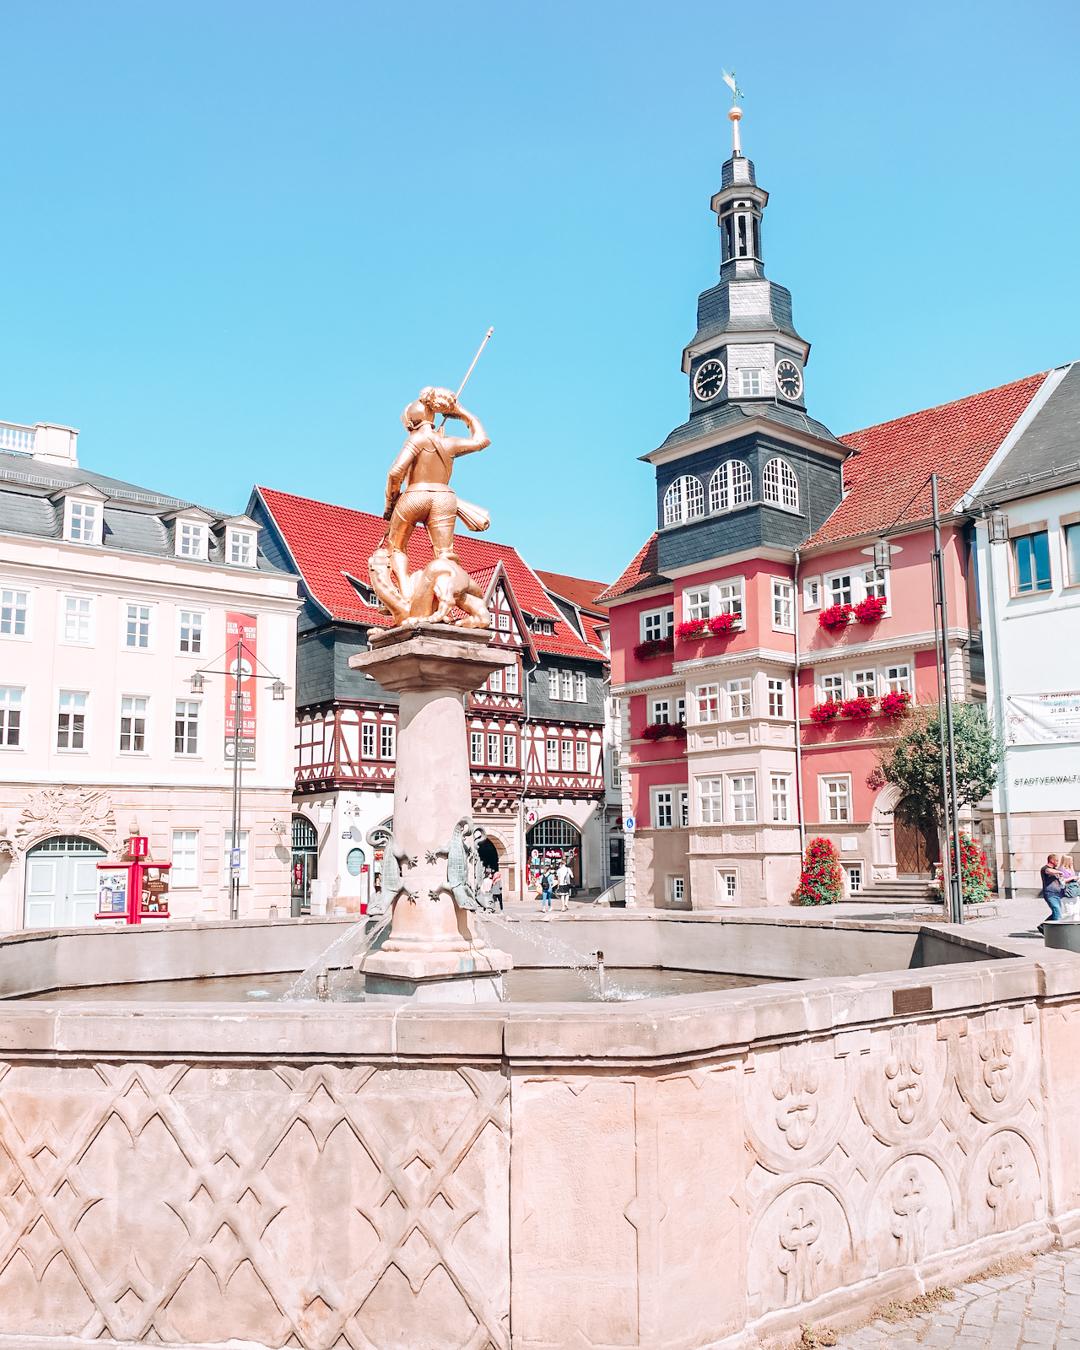 A fountain and buildings in Eisenach